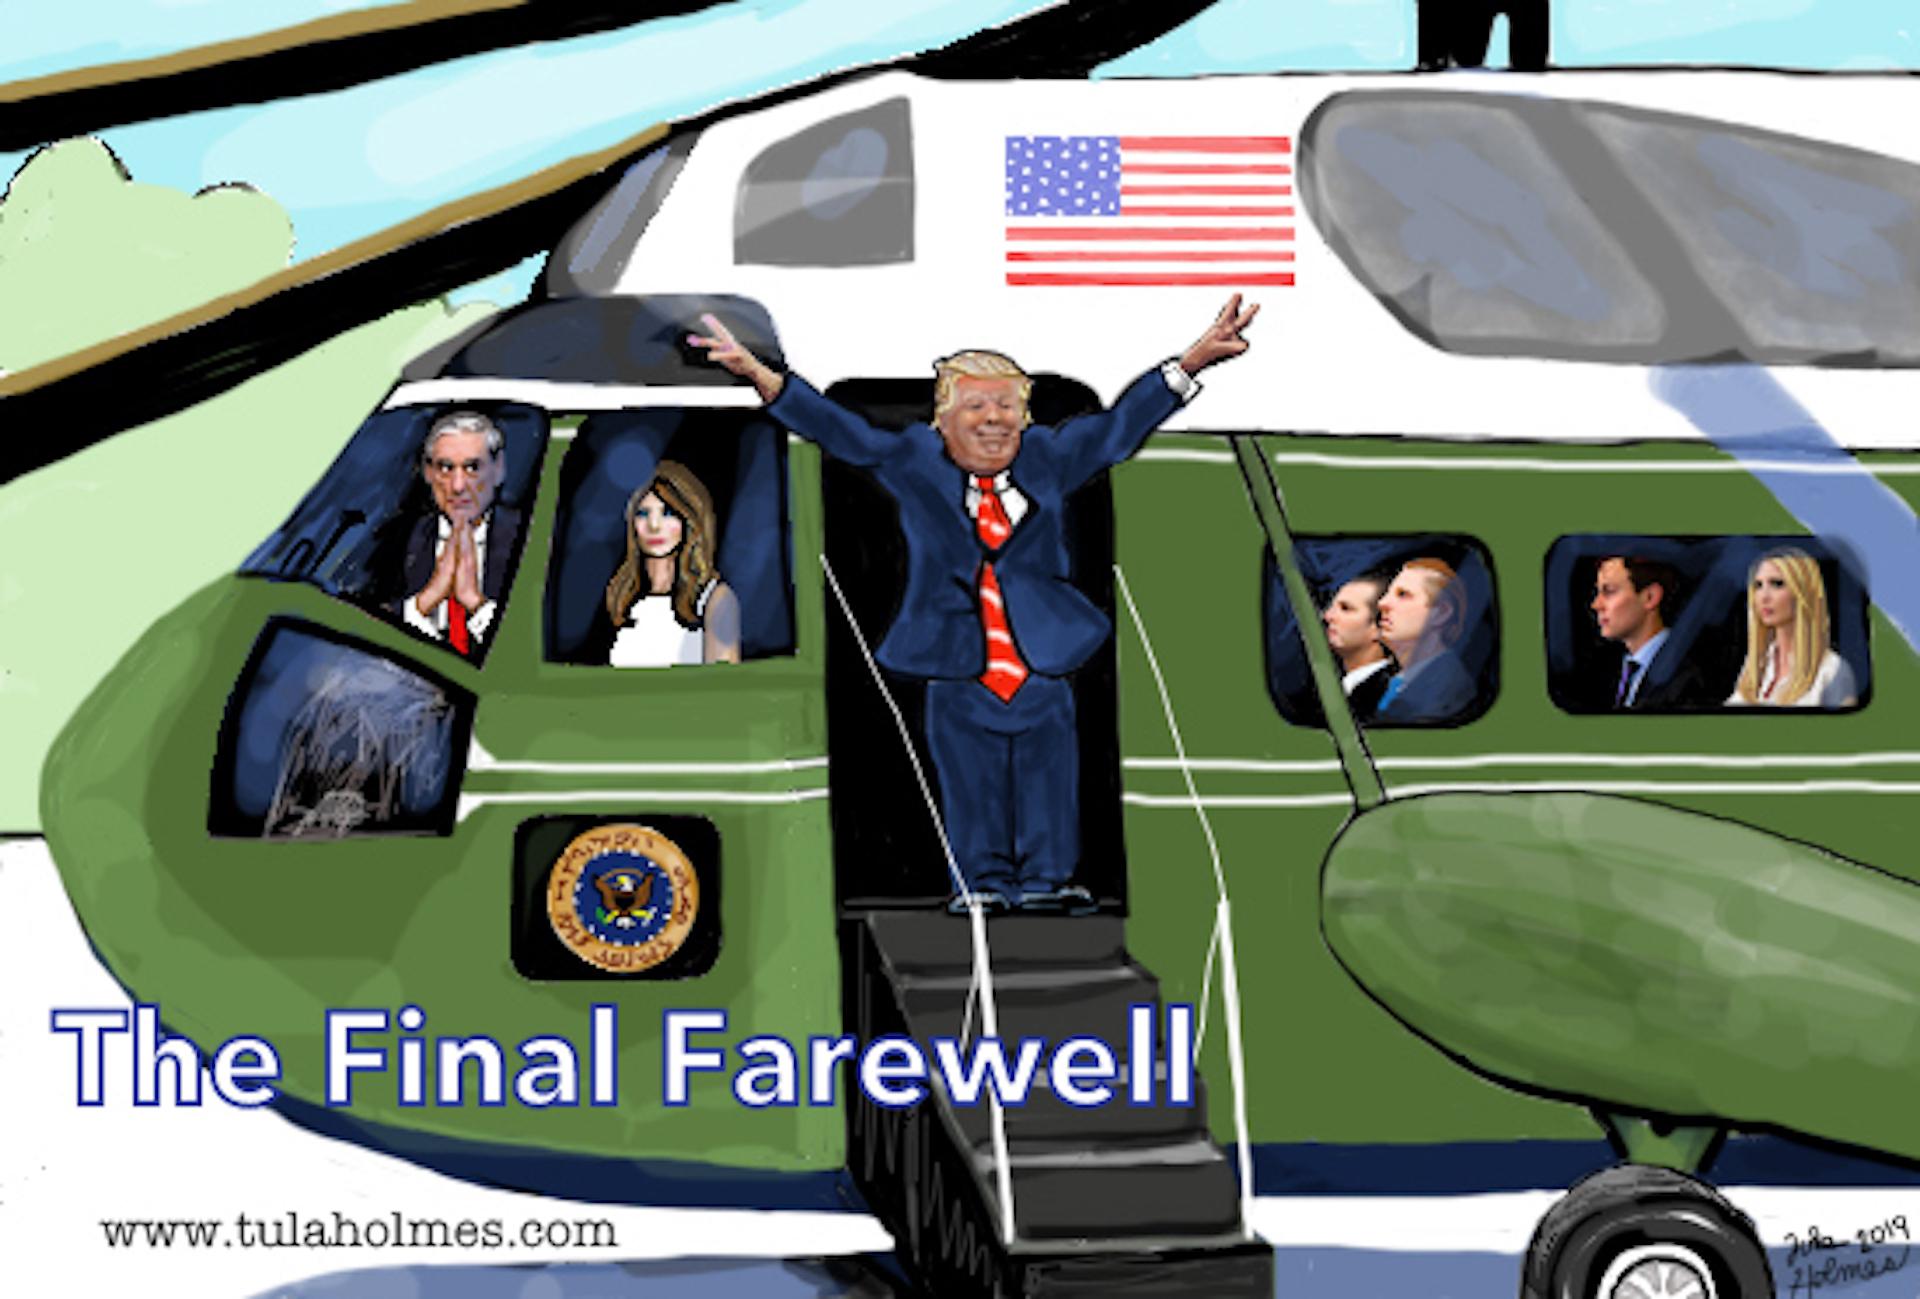 The Final Farewell- Copyright 2019